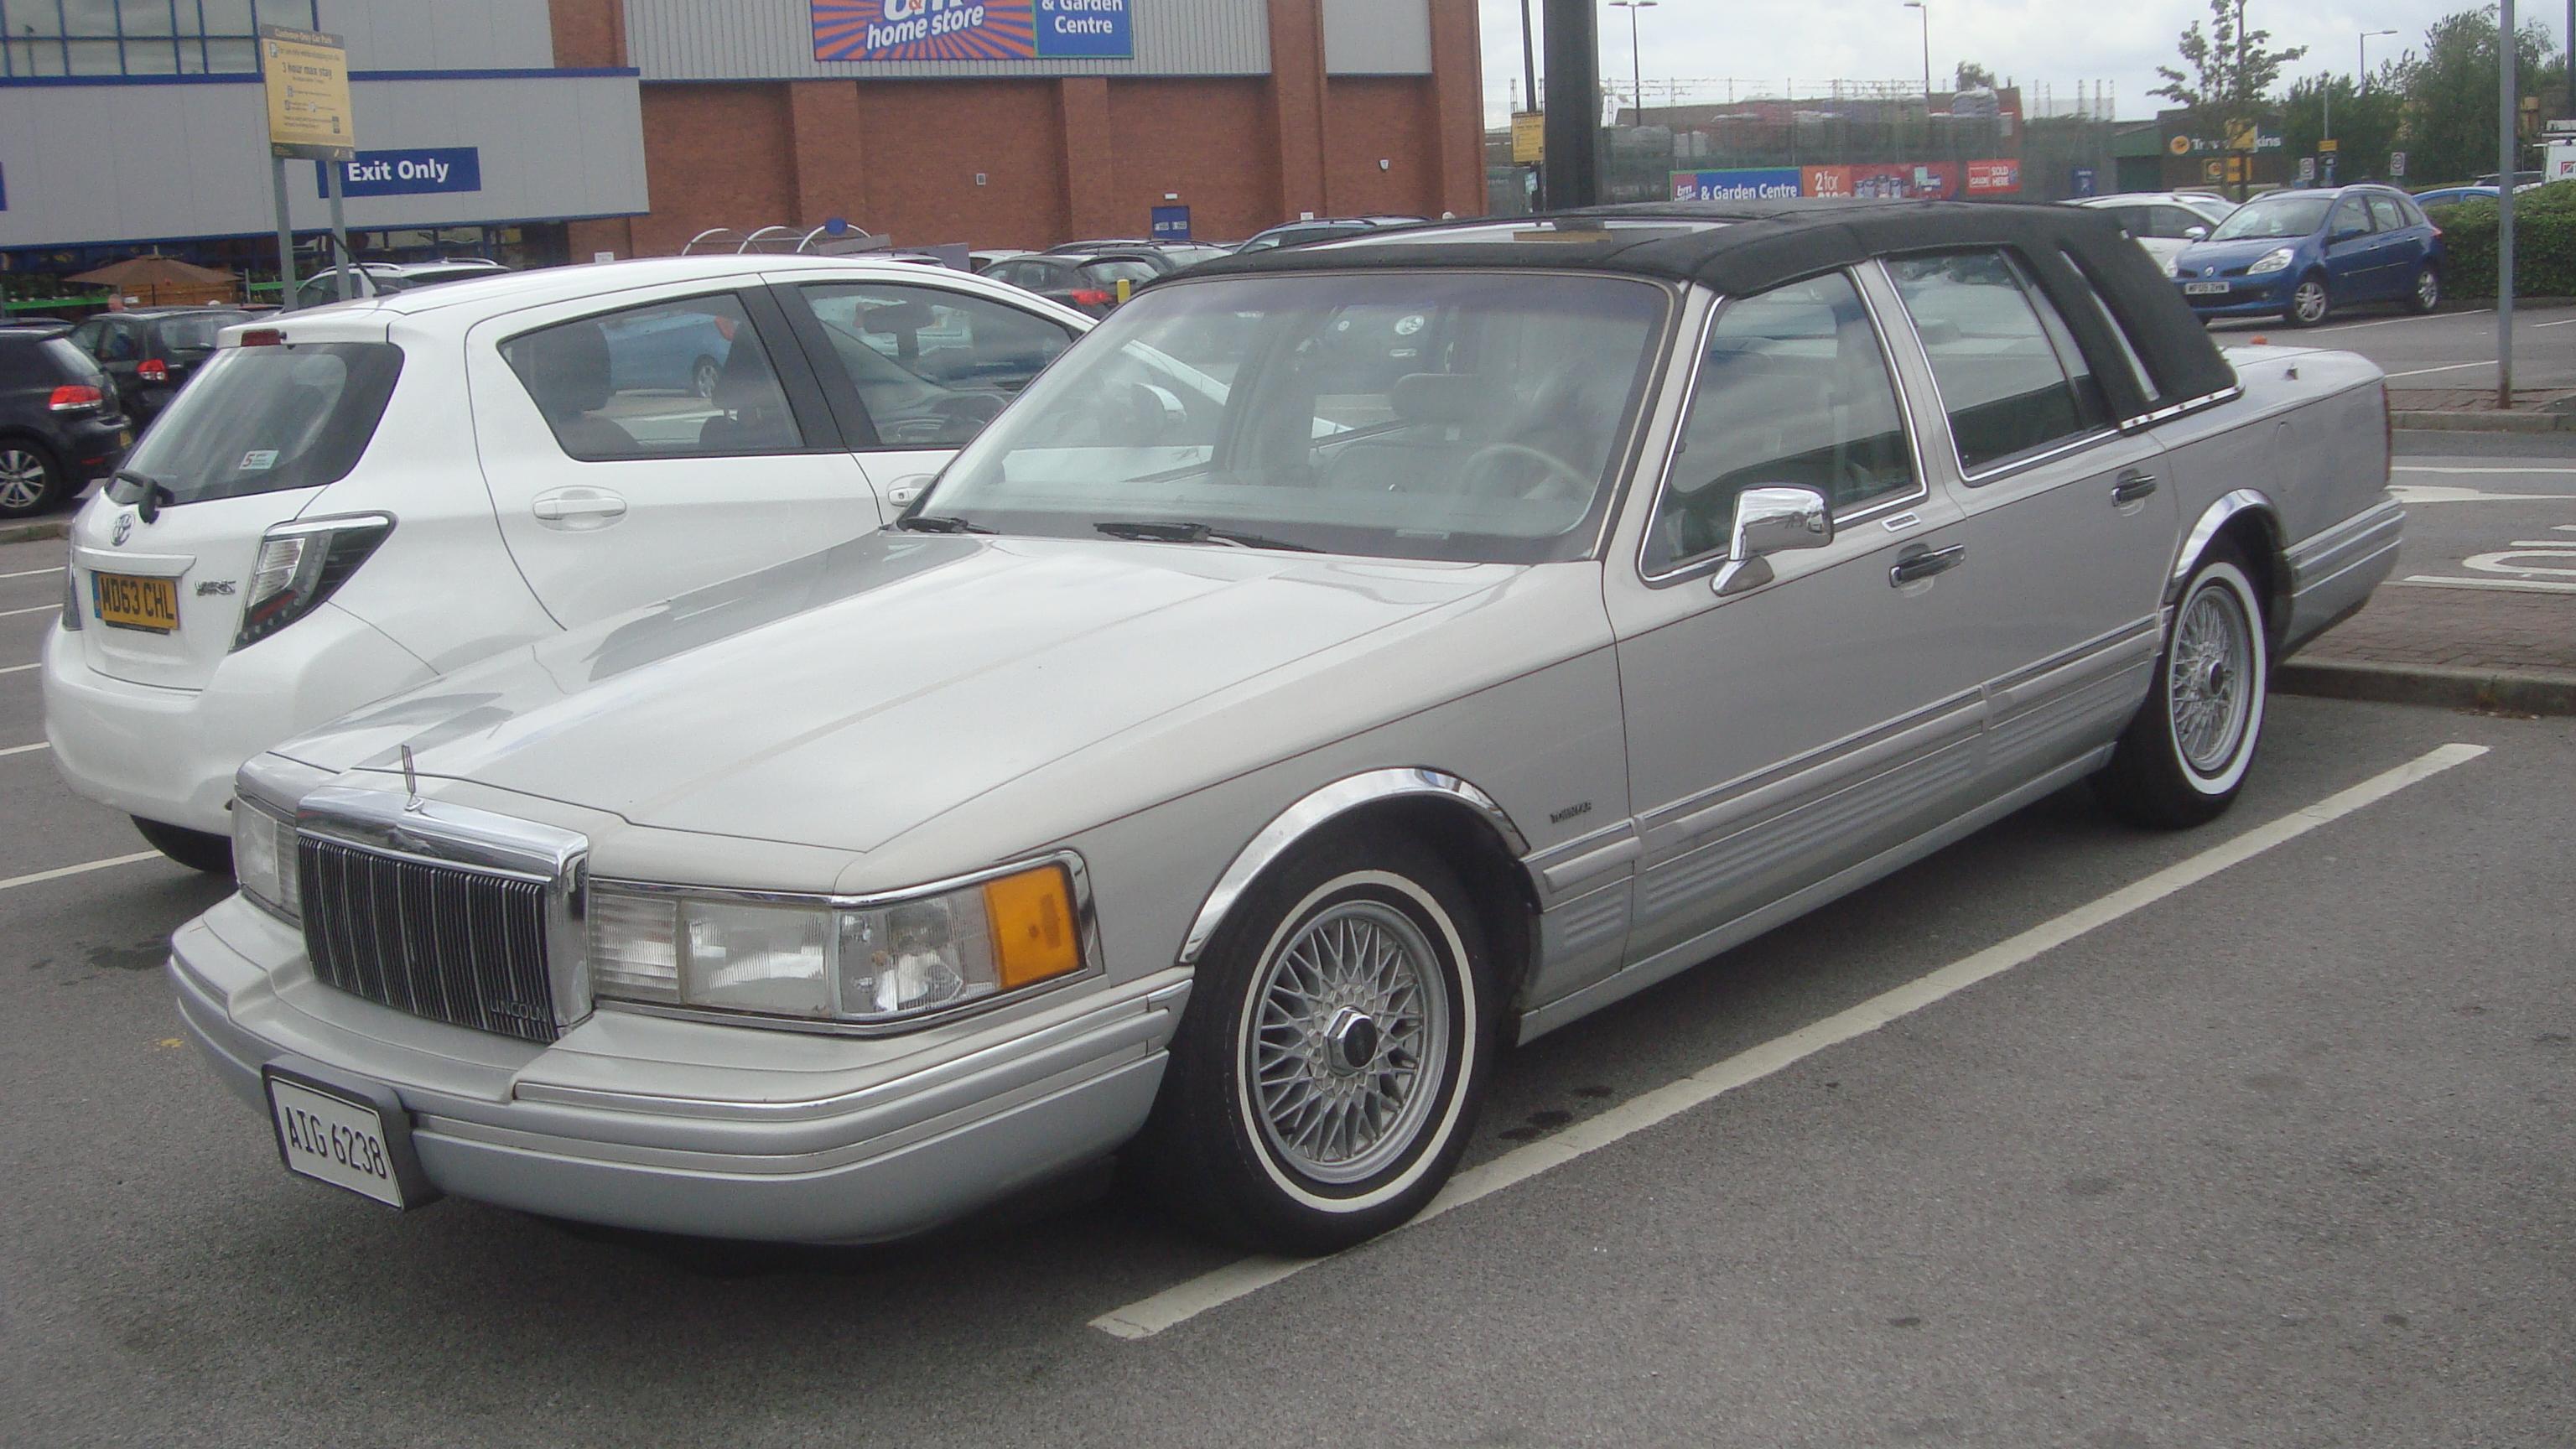 File 1991 Lincoln Town Car 4 6 V8 28178474396 Jpg Wikimedia Commons